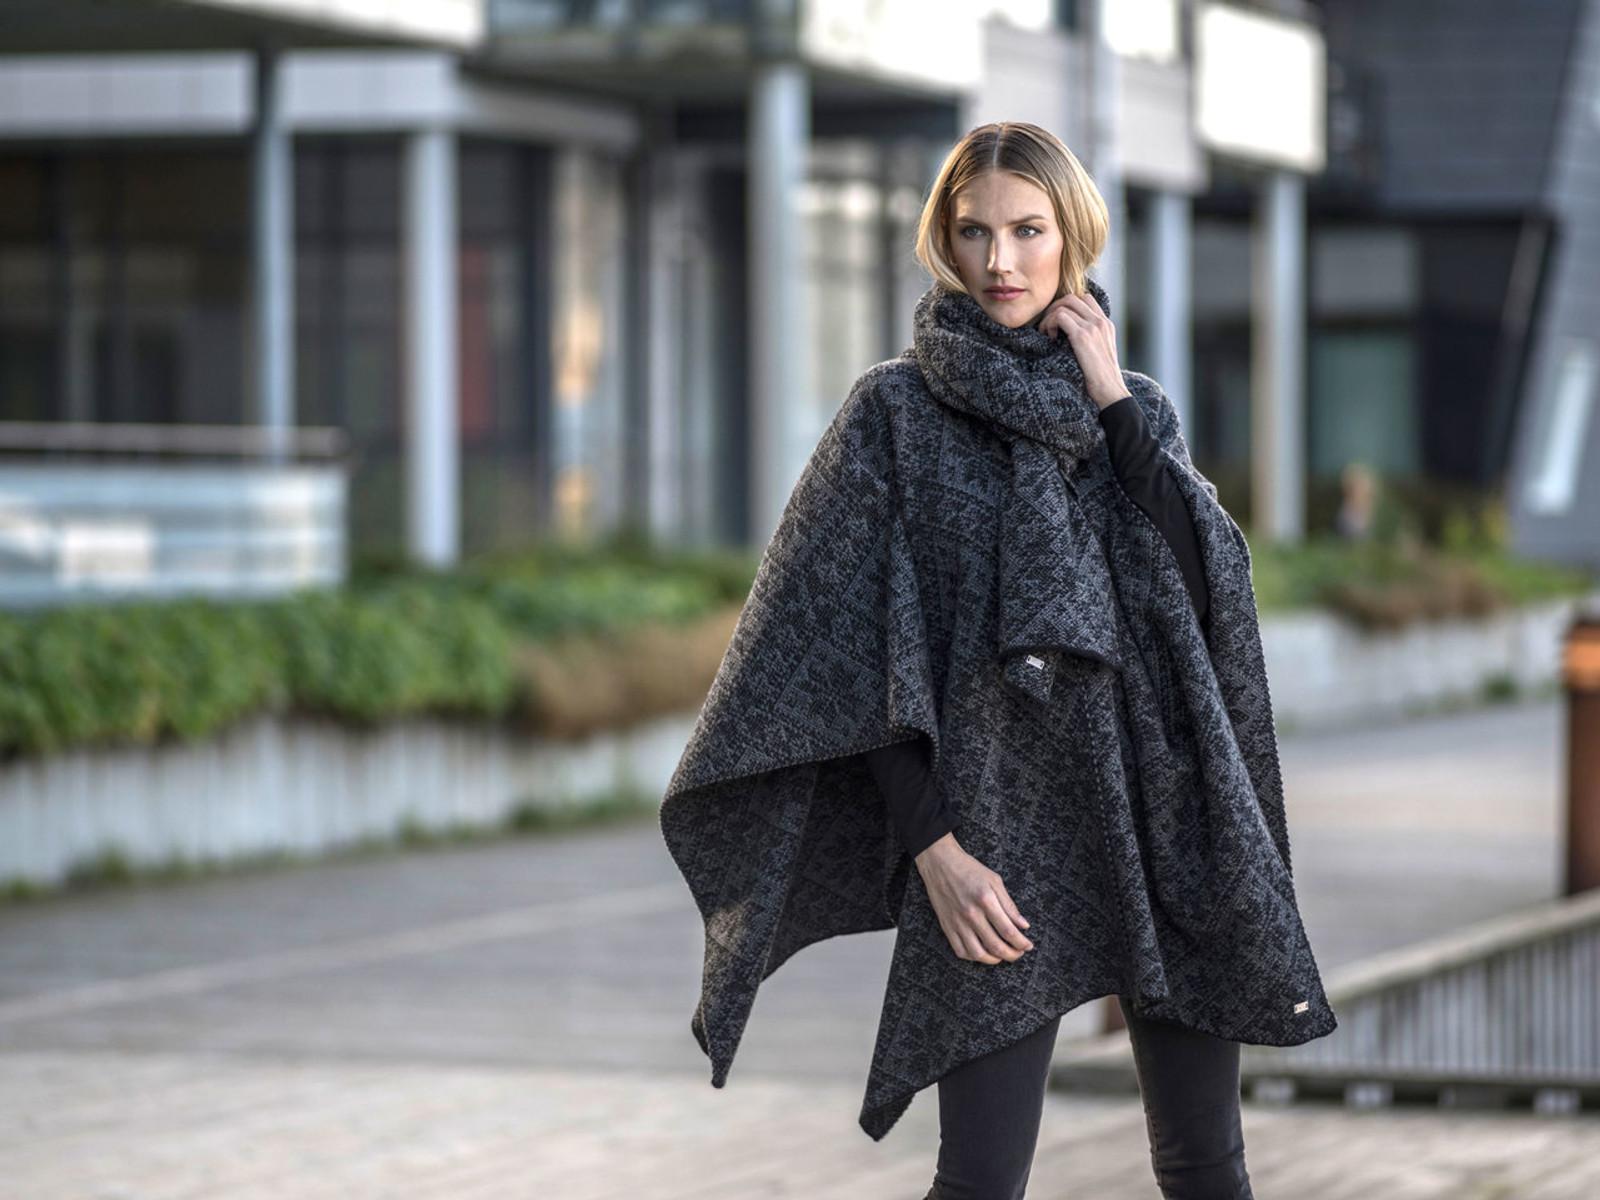 Woman walking downtown wearing Dale of Norway's Rose Ladies Shawl in Black/Smoke, 11651-E, and Rose Scarf in Black/Smoke, 11661-E